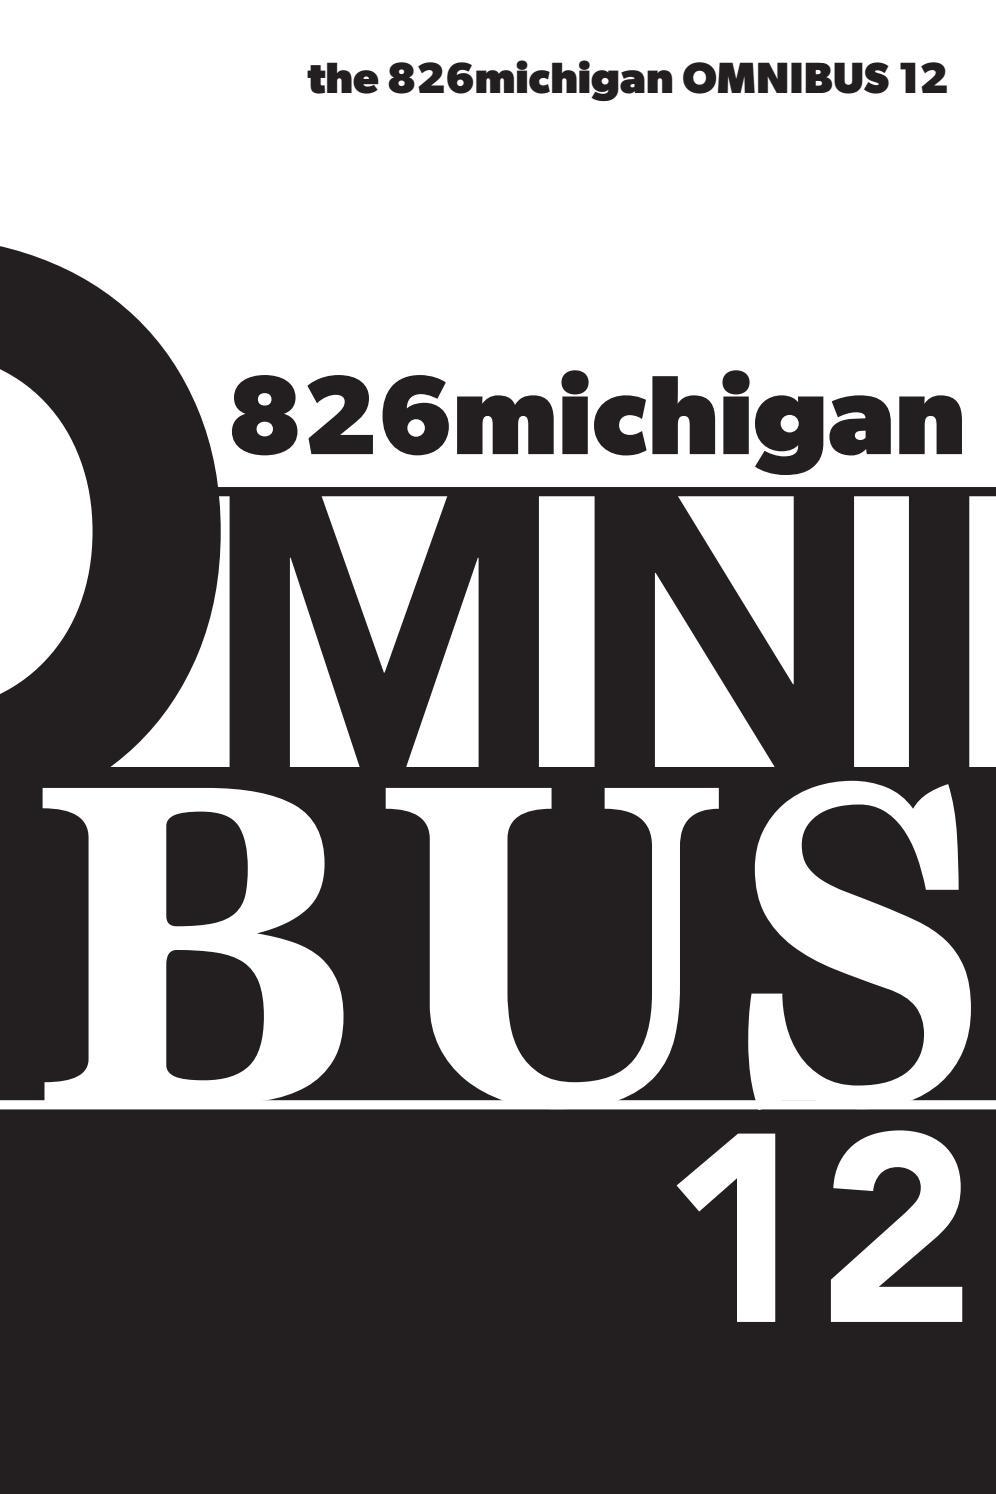 826michigan Omnibus 12 2020 By 826michigan Issuu